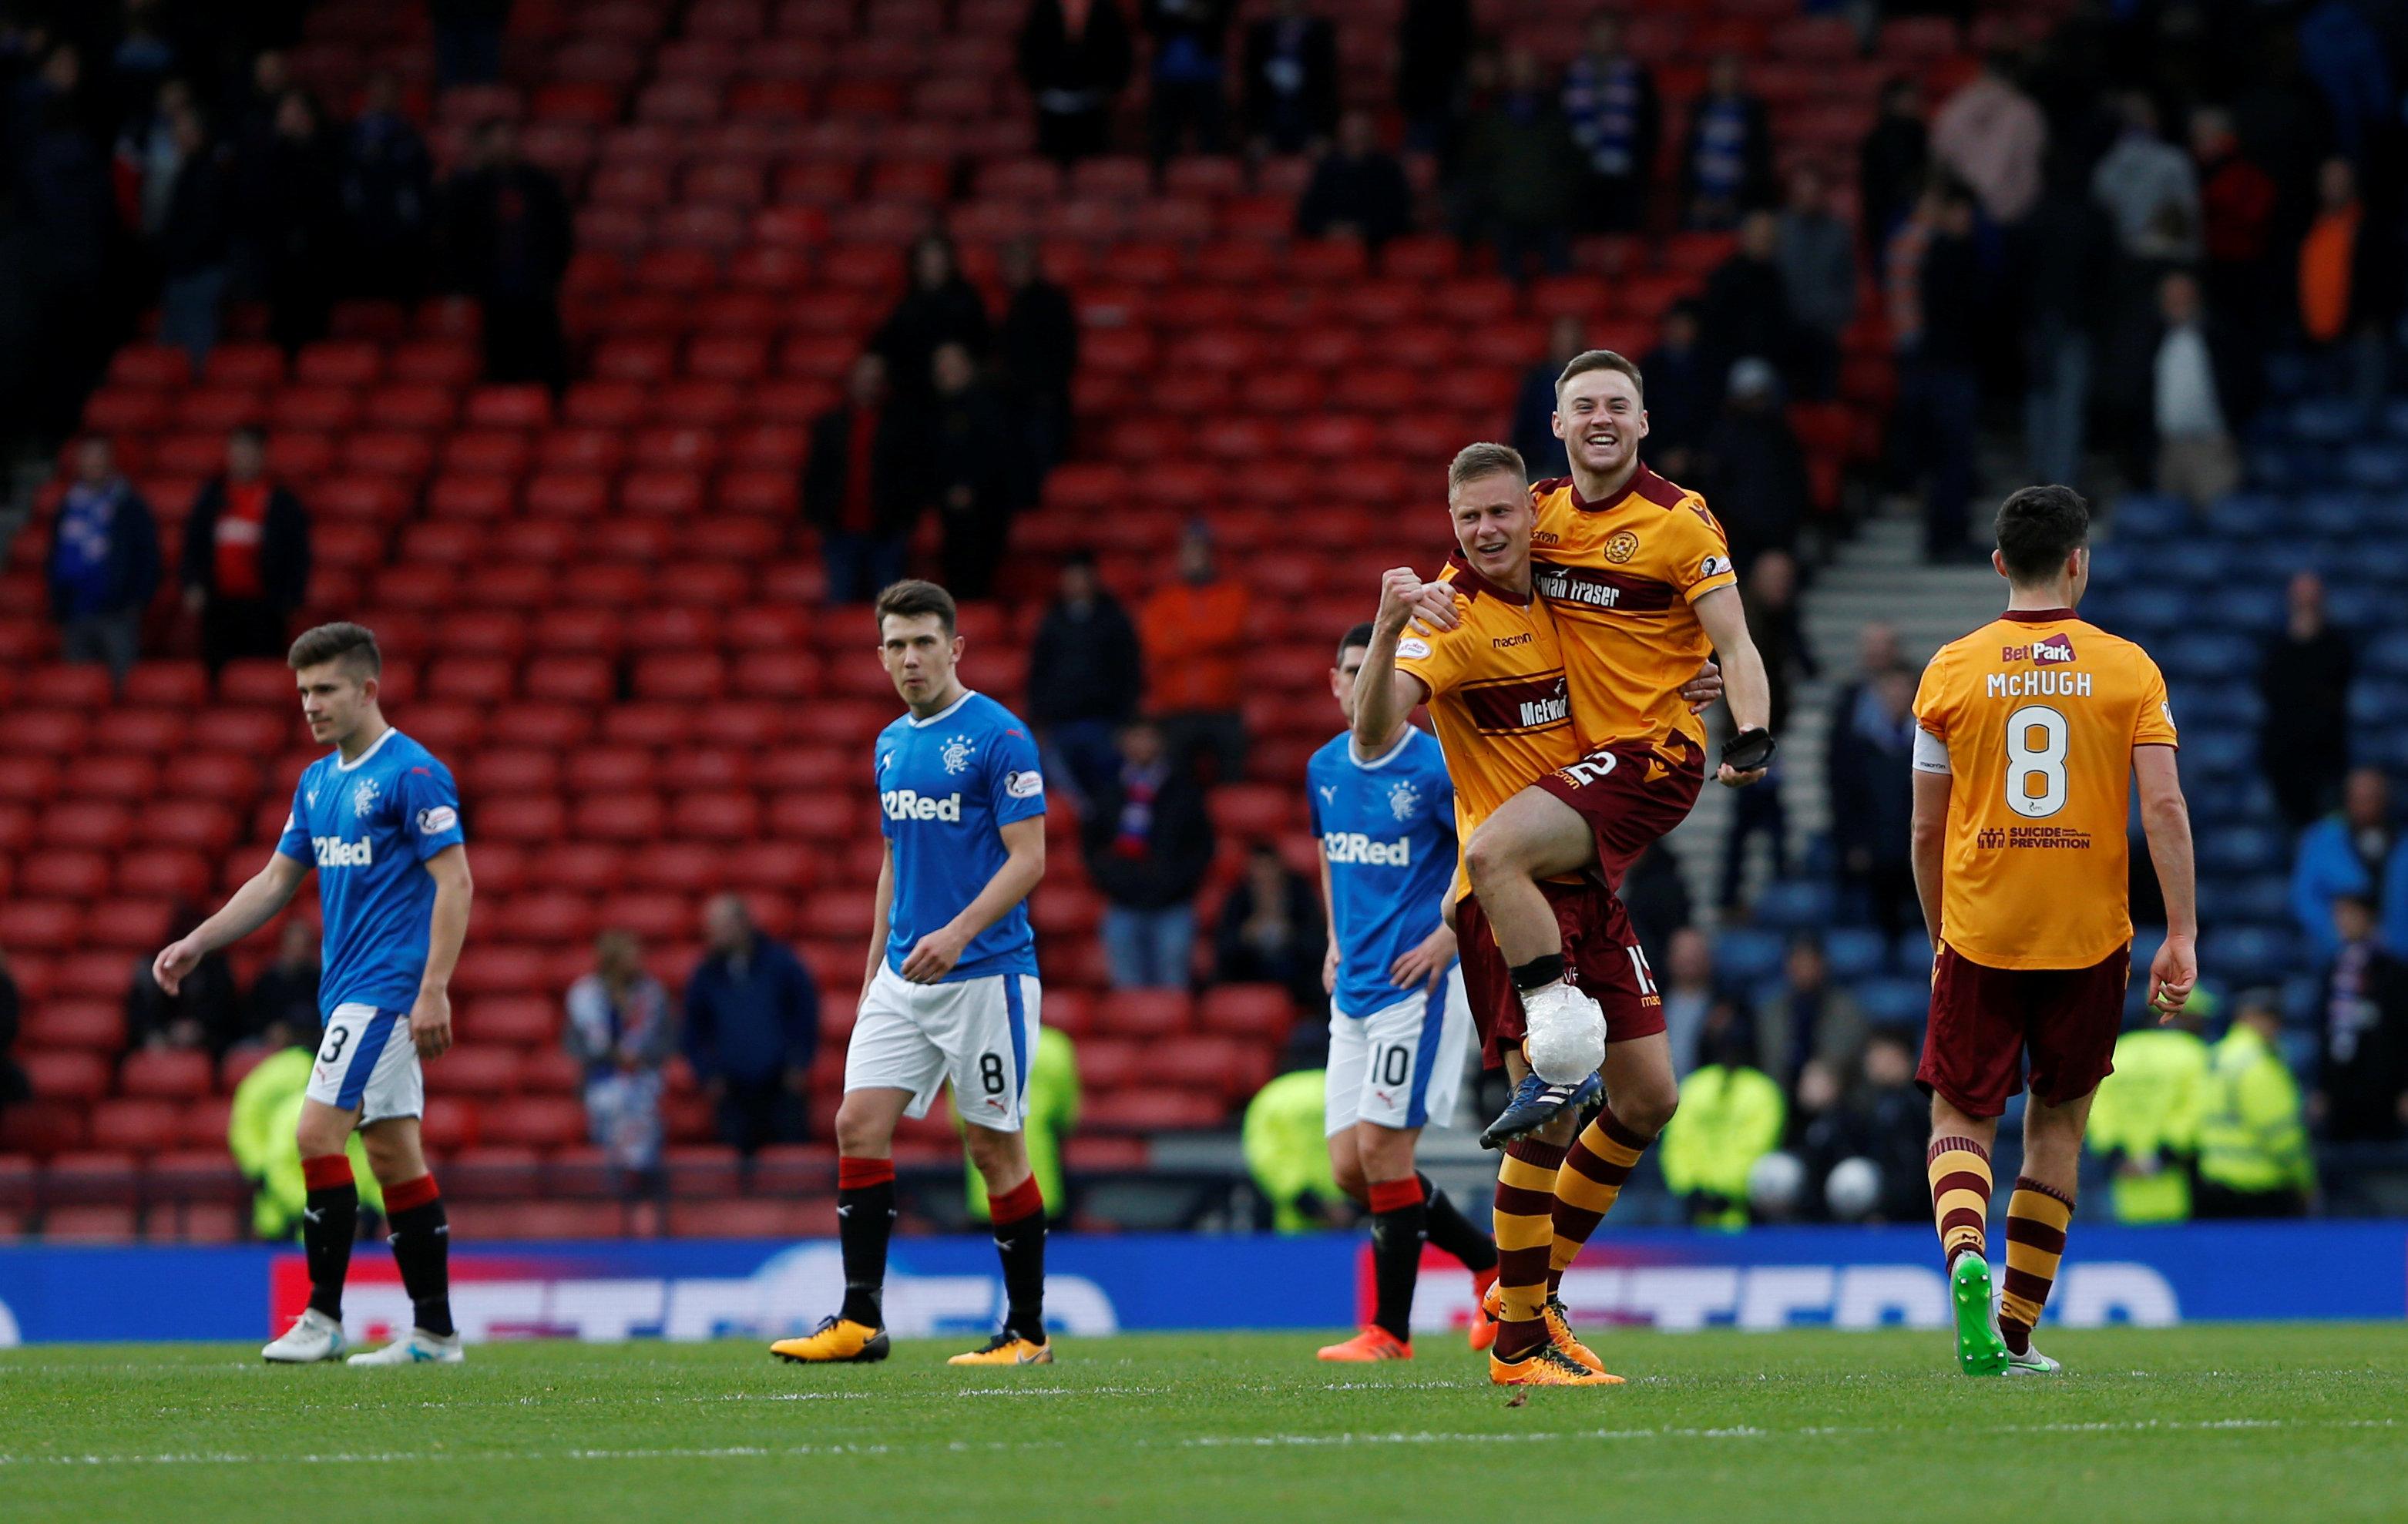 Scottish League Cup Semi Final – Rangers vs Motherwell